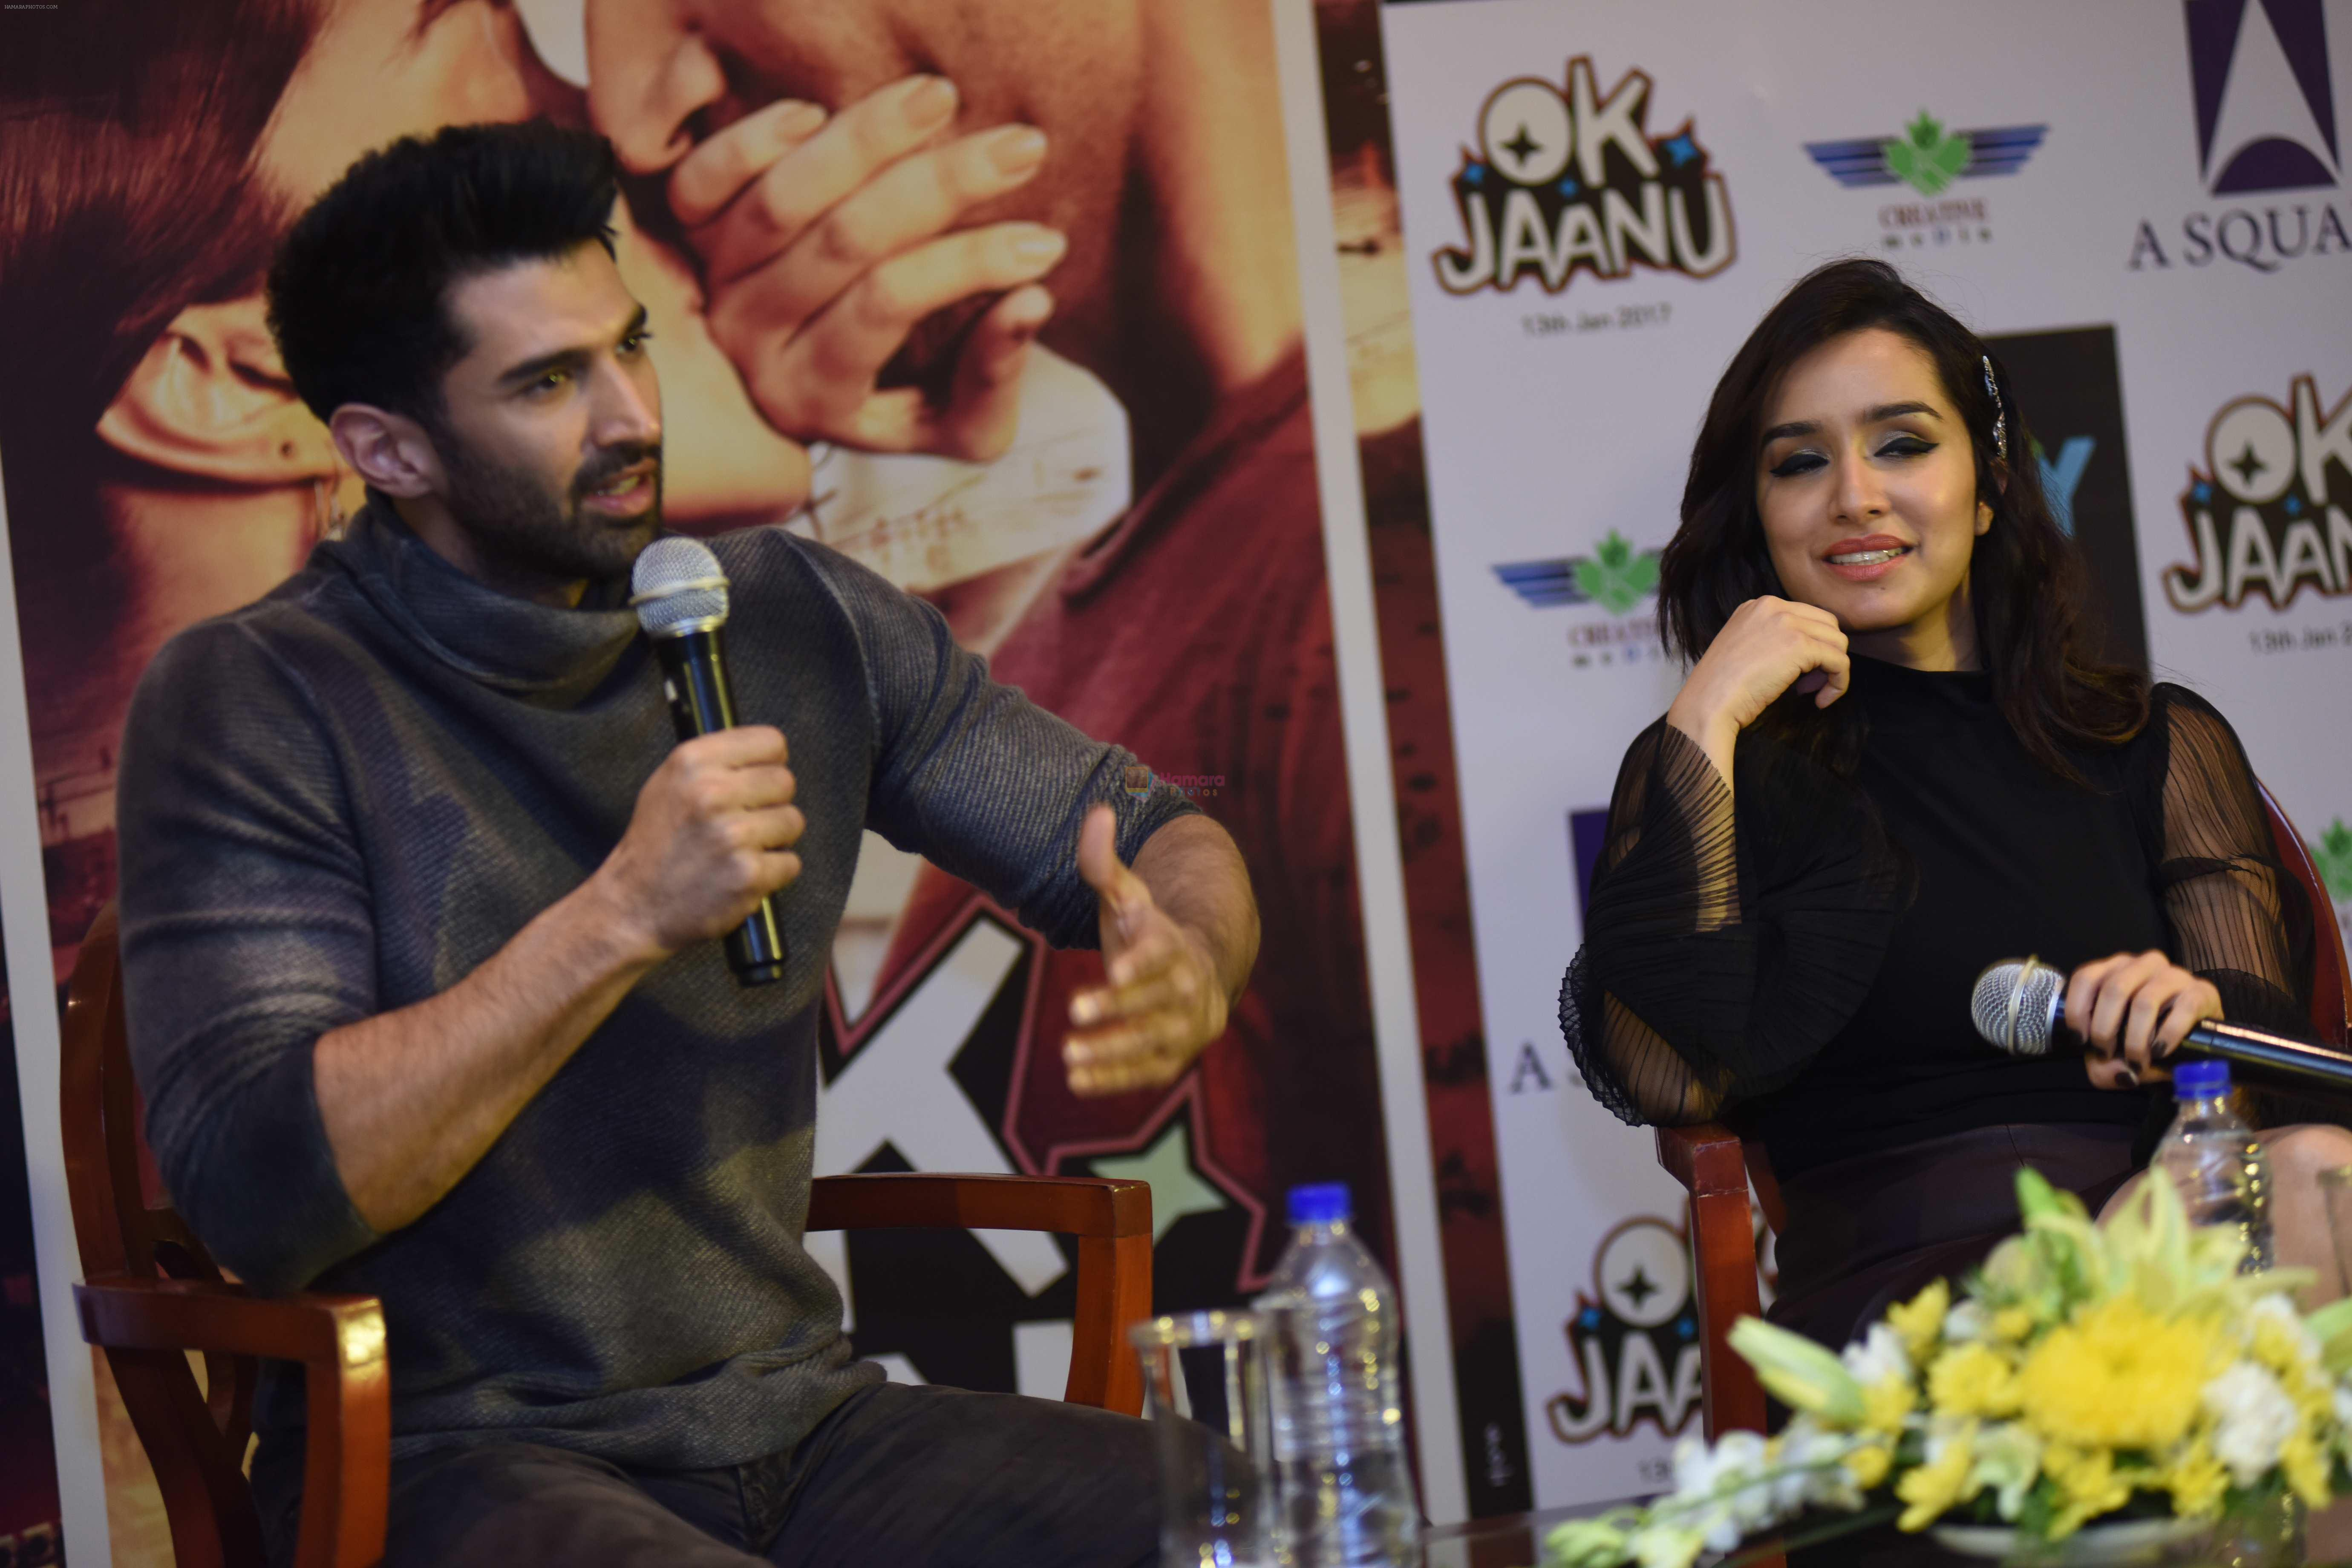 Shraddha Kapoor, Aditya Roy Kapoor promotes Ok Jaanu in Delhi on 11th Jan 2017